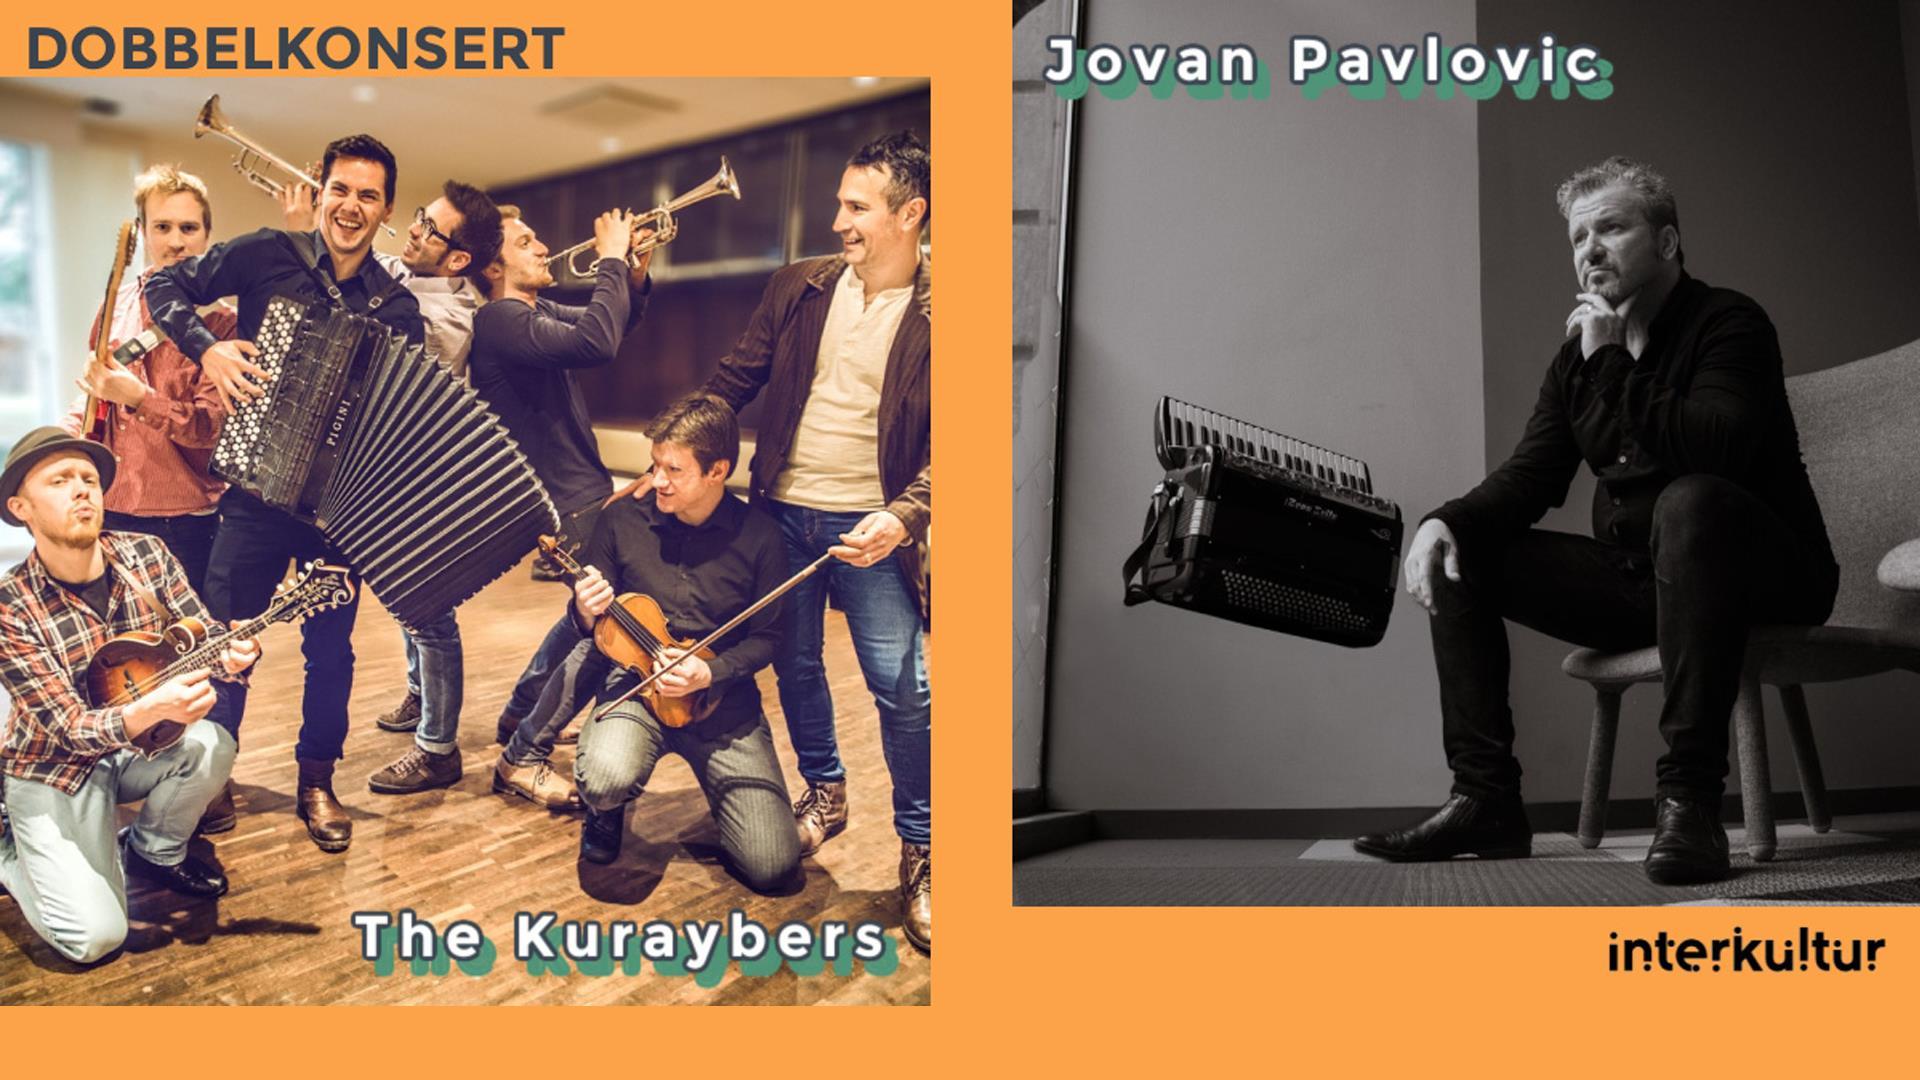 Jovan Pavlovic og The Kuraybers